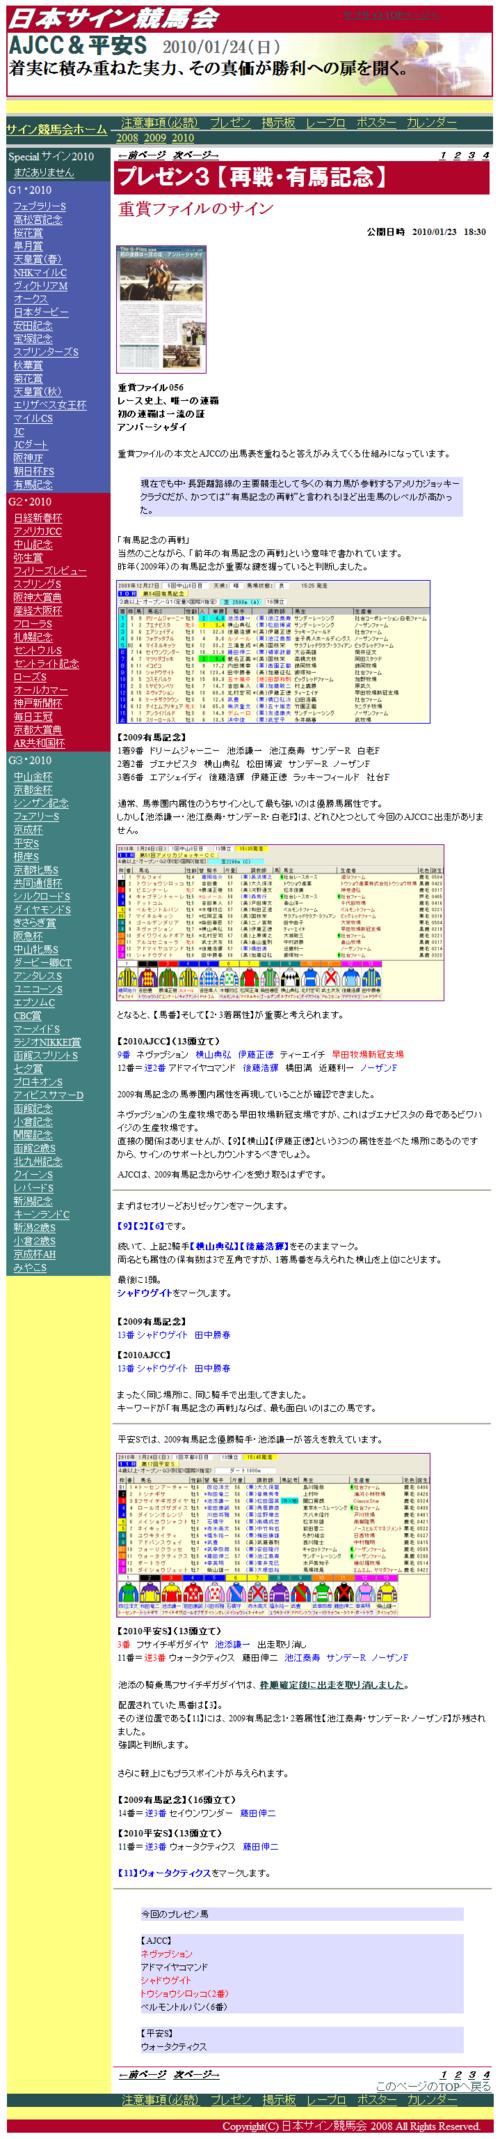 Jrssample201001243